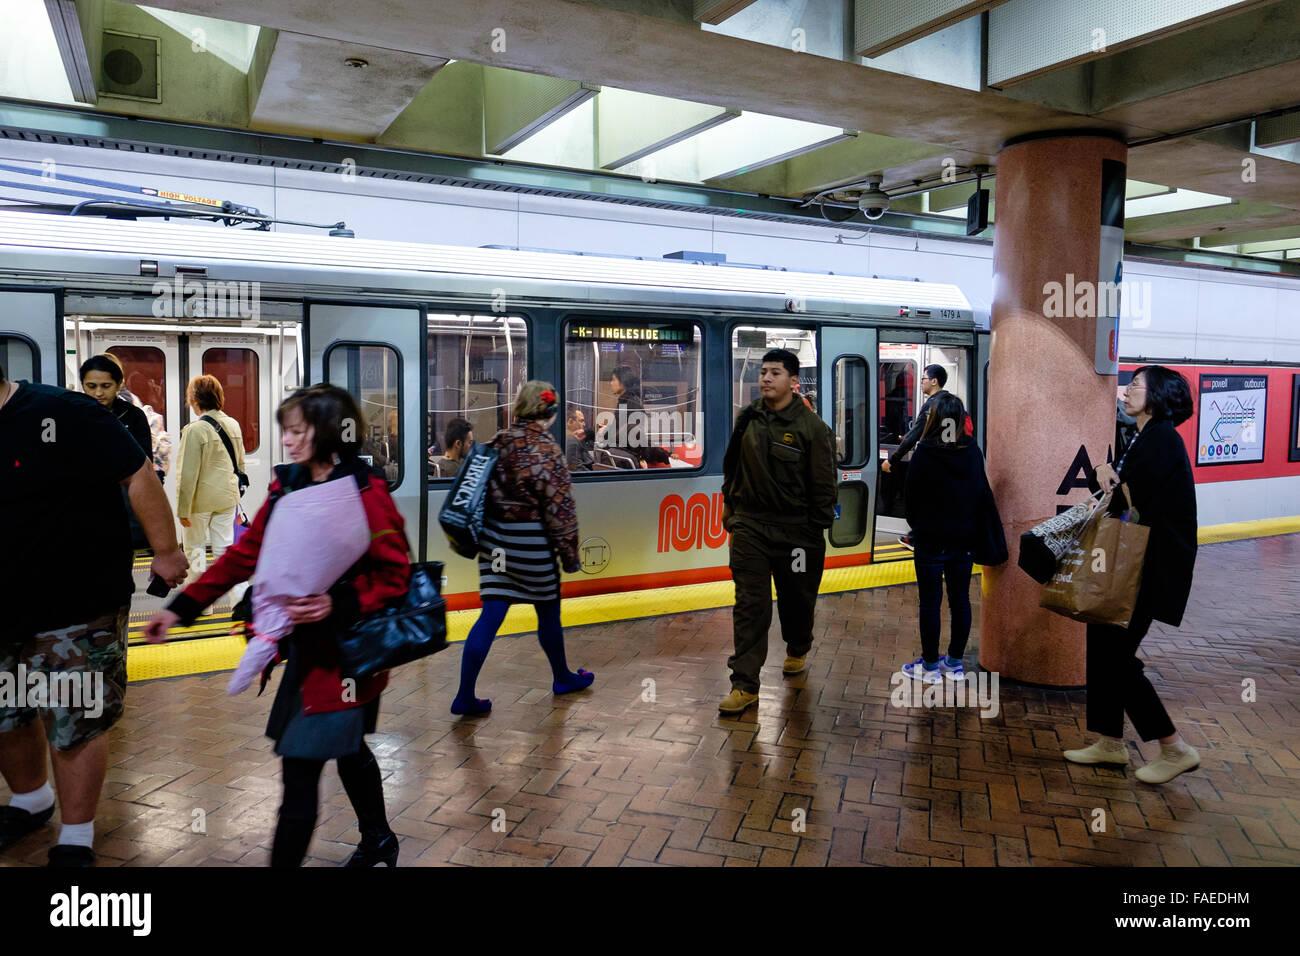 SAN FRANCISCO, CA - DECEMBER 10, 2015: San Francisco underground subway transportation station for Muni and Bart. - Stock Image